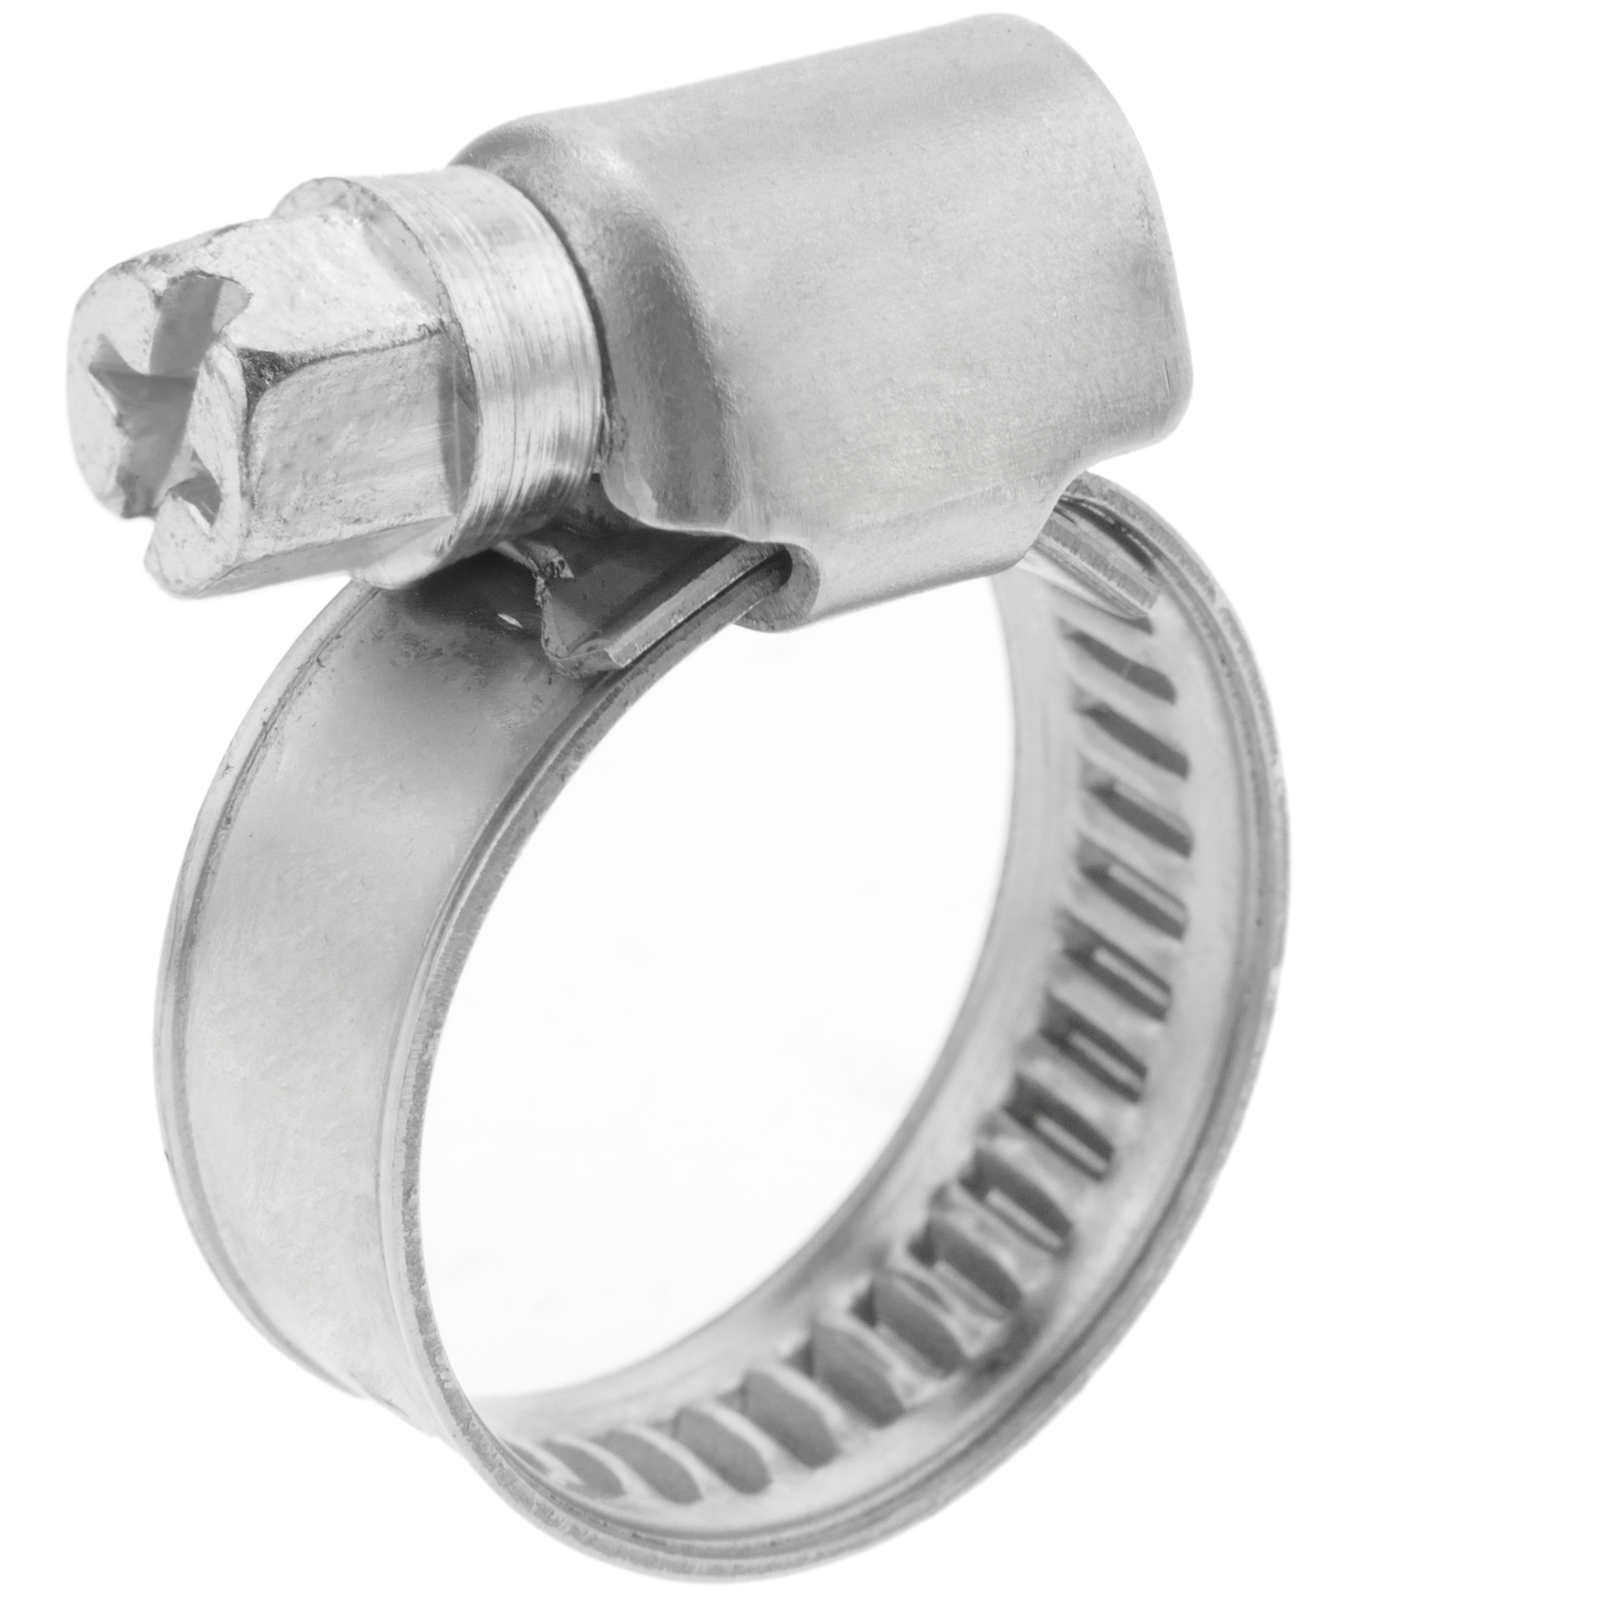 Lot de 2 colliers de serrage r/églables en acier inoxydable /Ø 60-80 mm